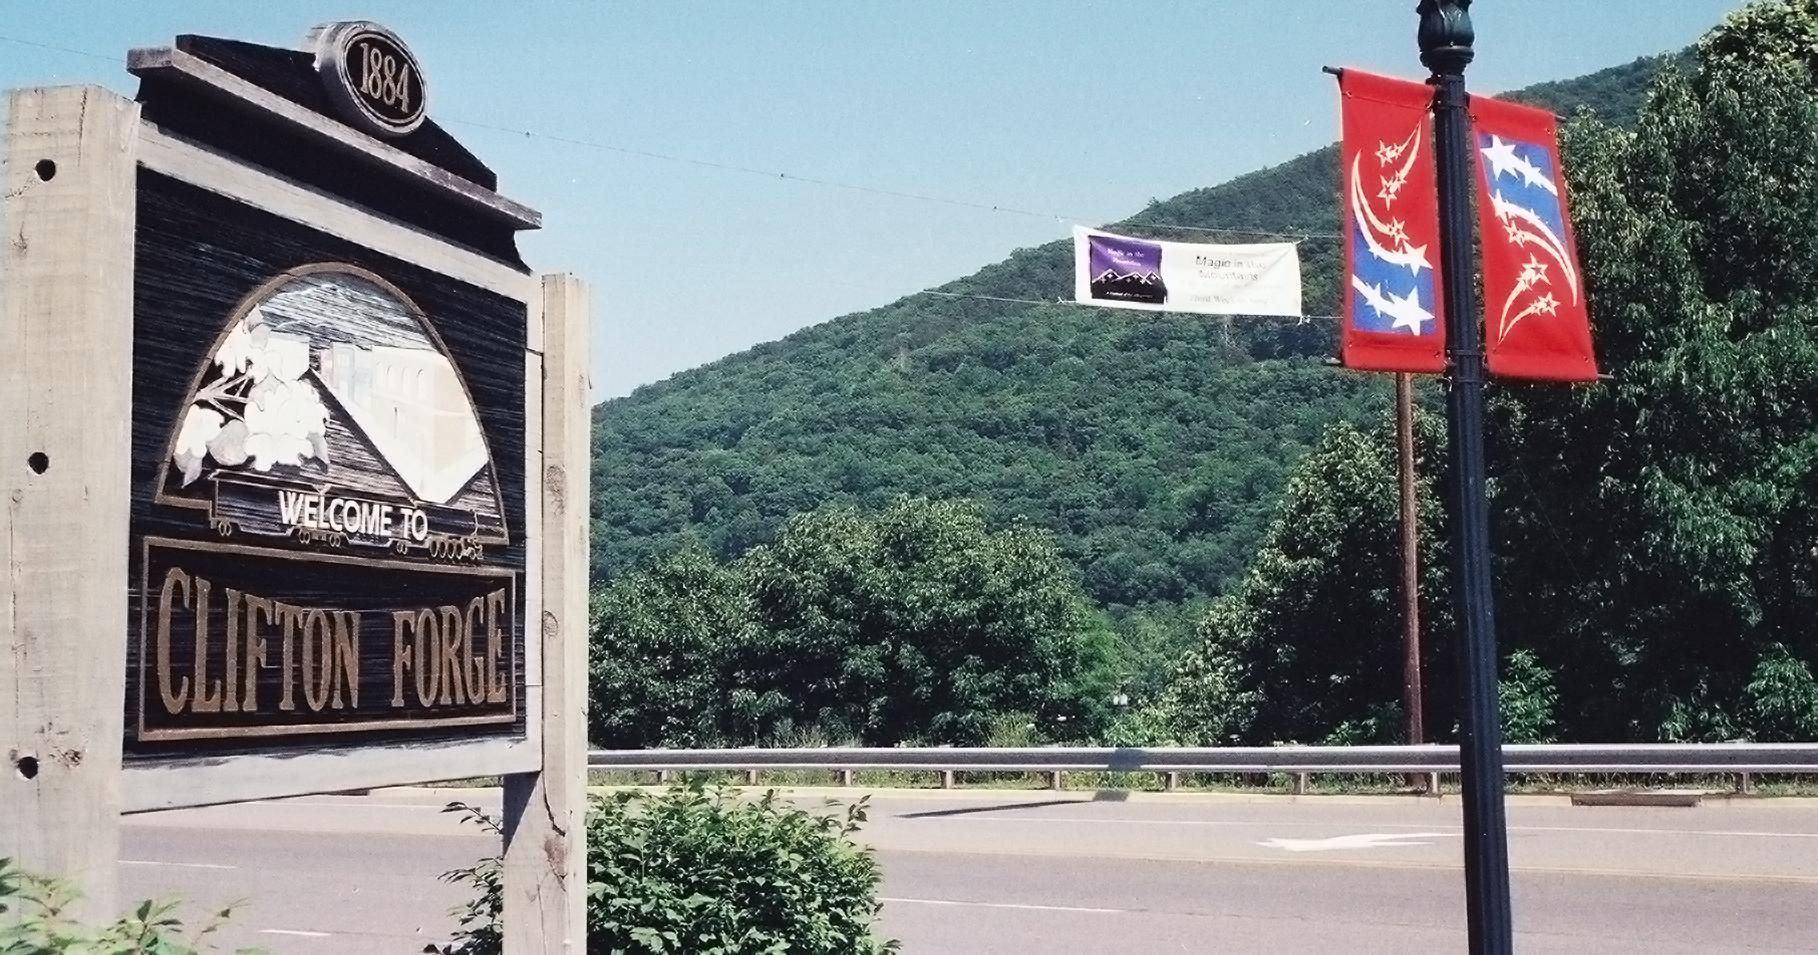 Clifton Forge, Virginia